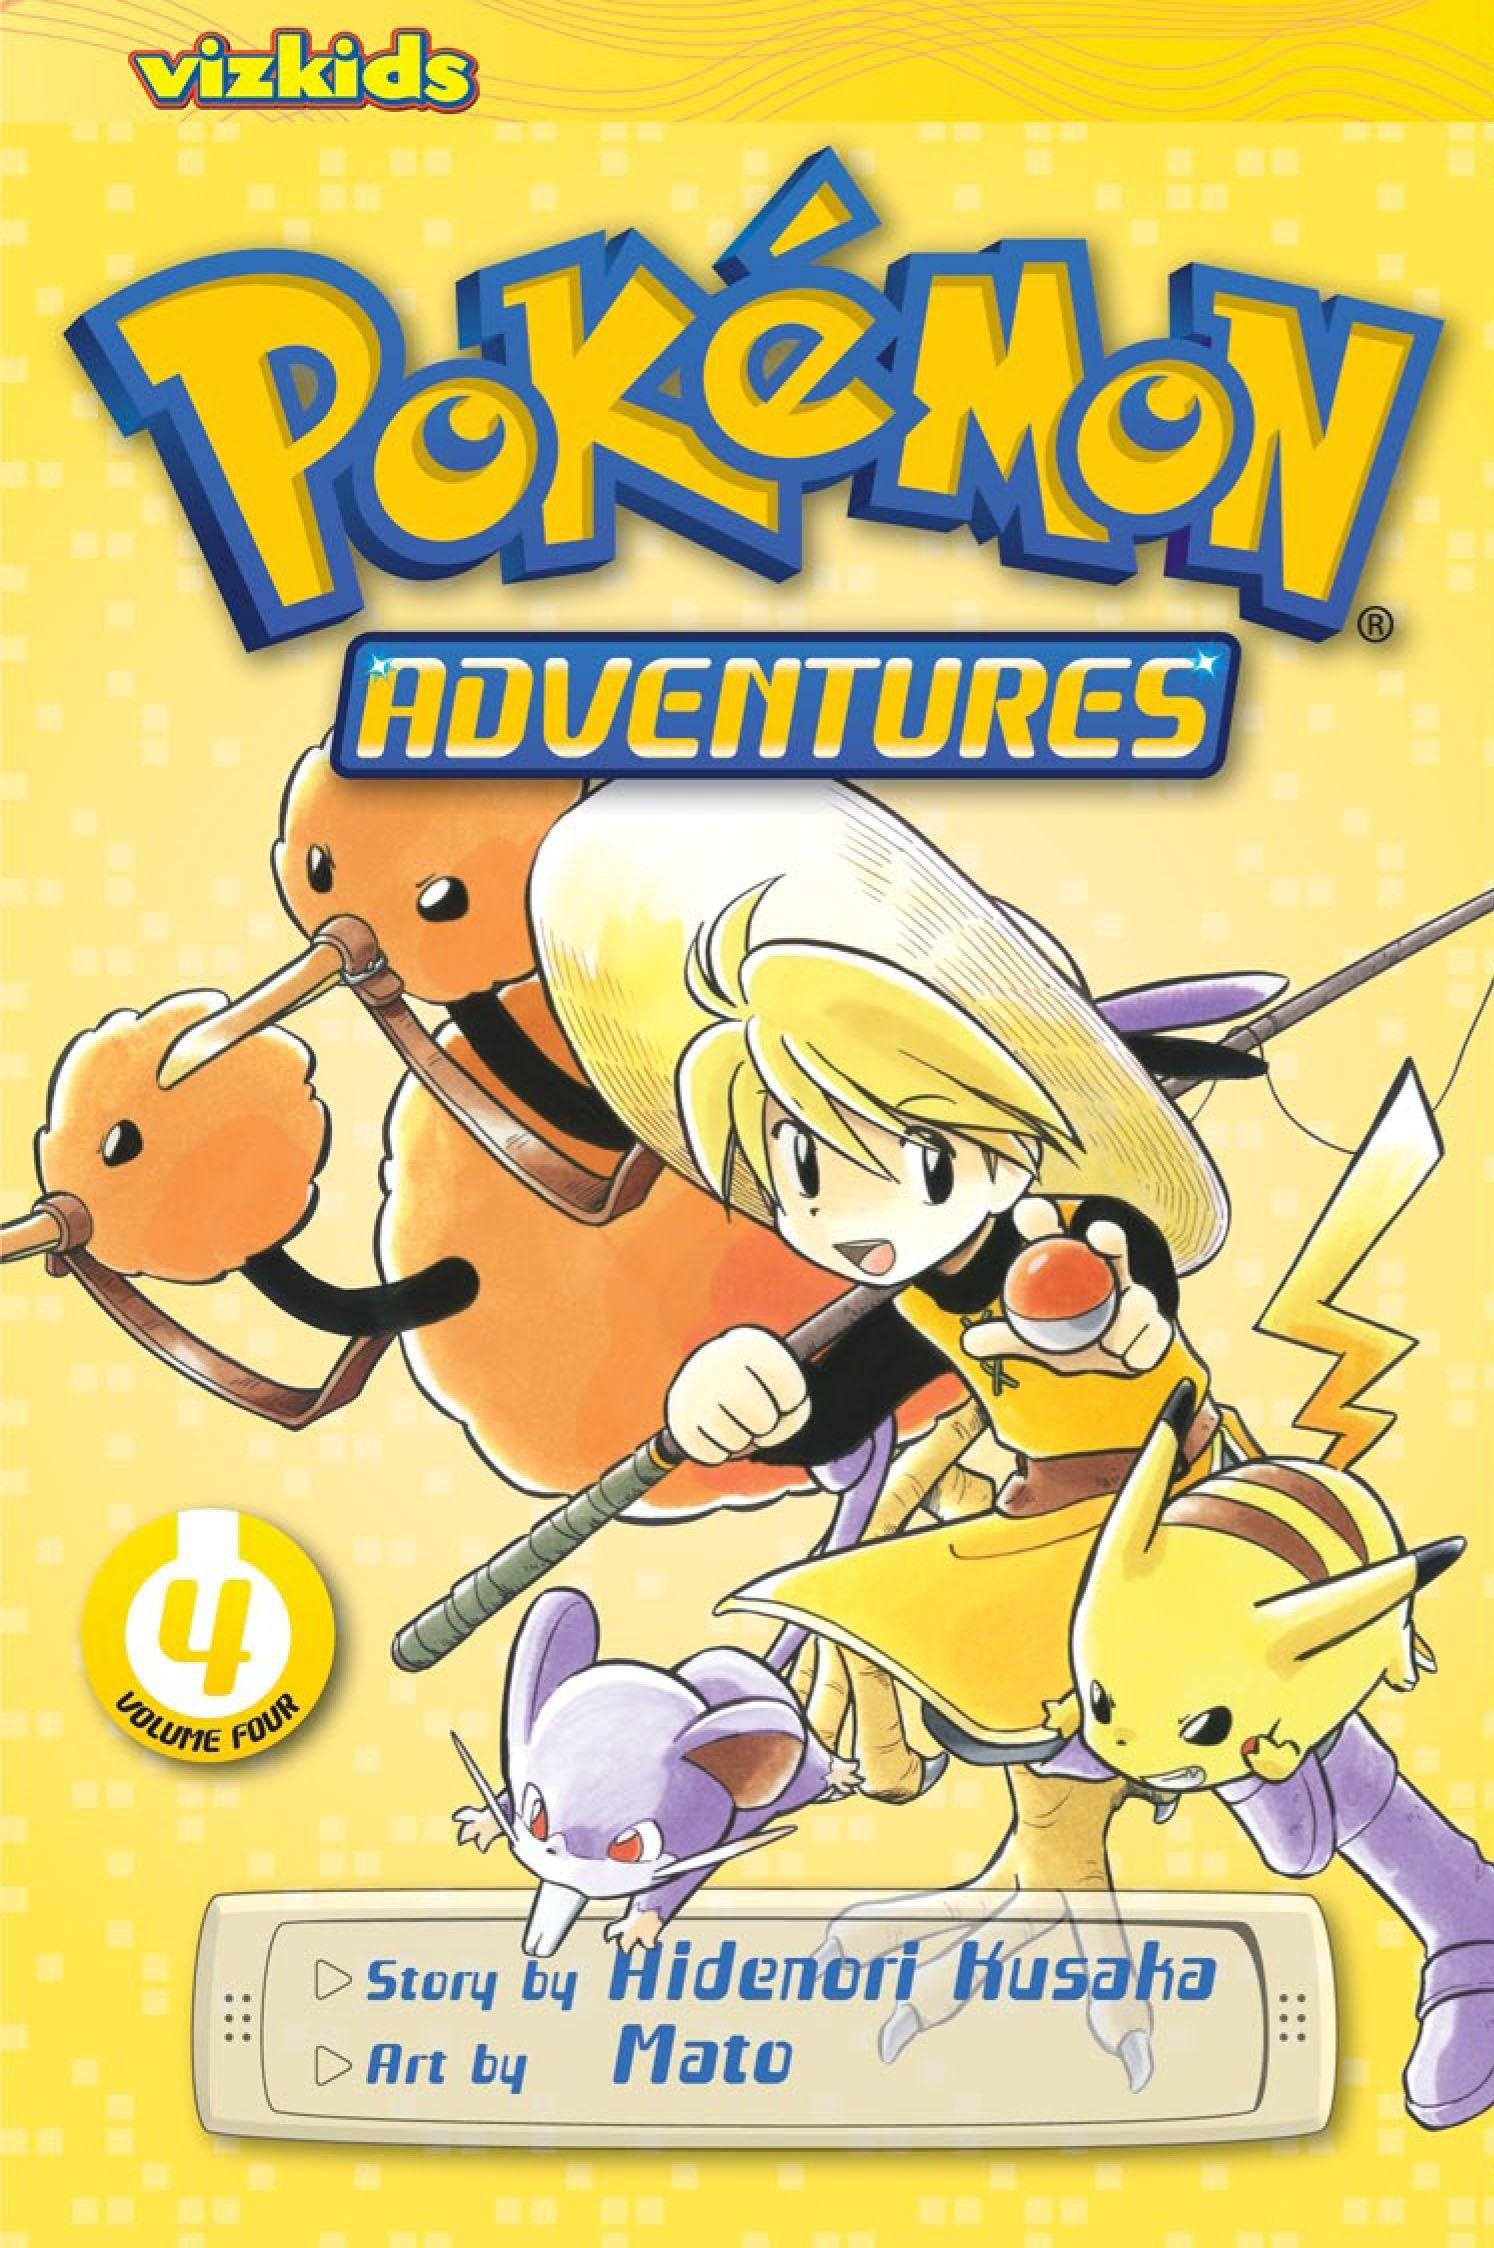 Pokémon Adventures, Vol. 4 (2nd Edition): Hidenori Kusaka ...